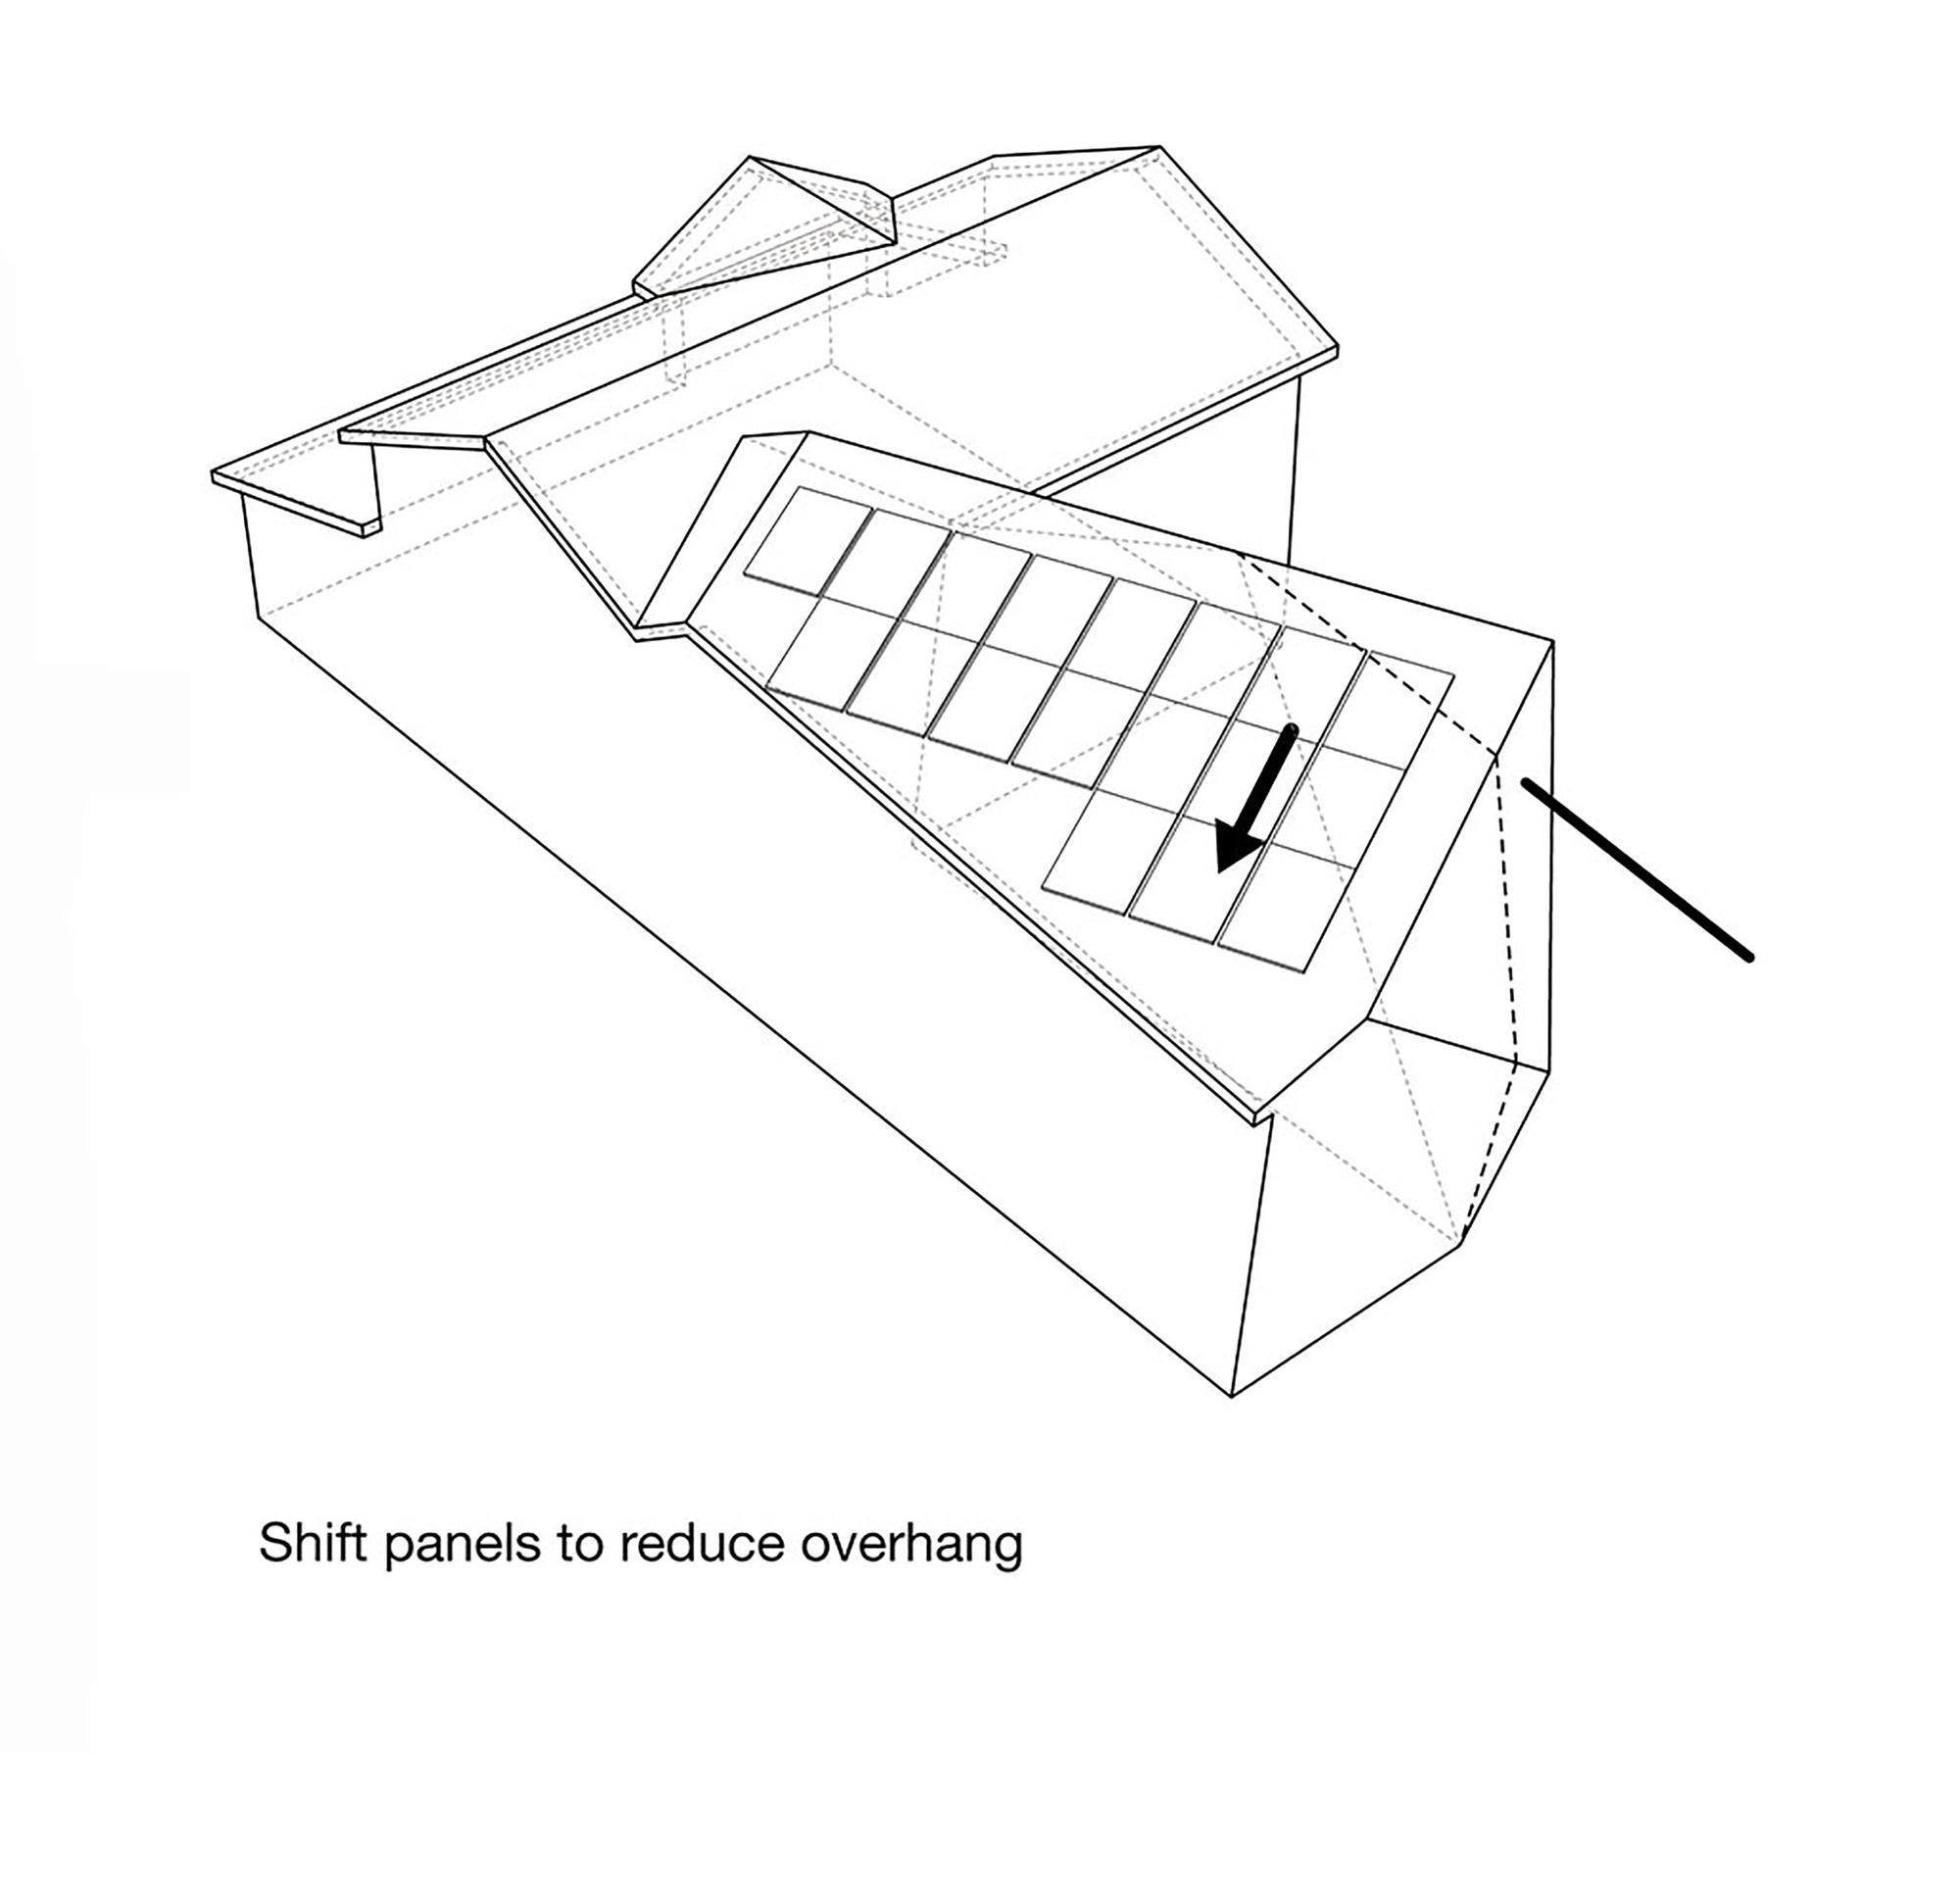 2000x1922 Gallery Of Slrsrf Open Source Architecture